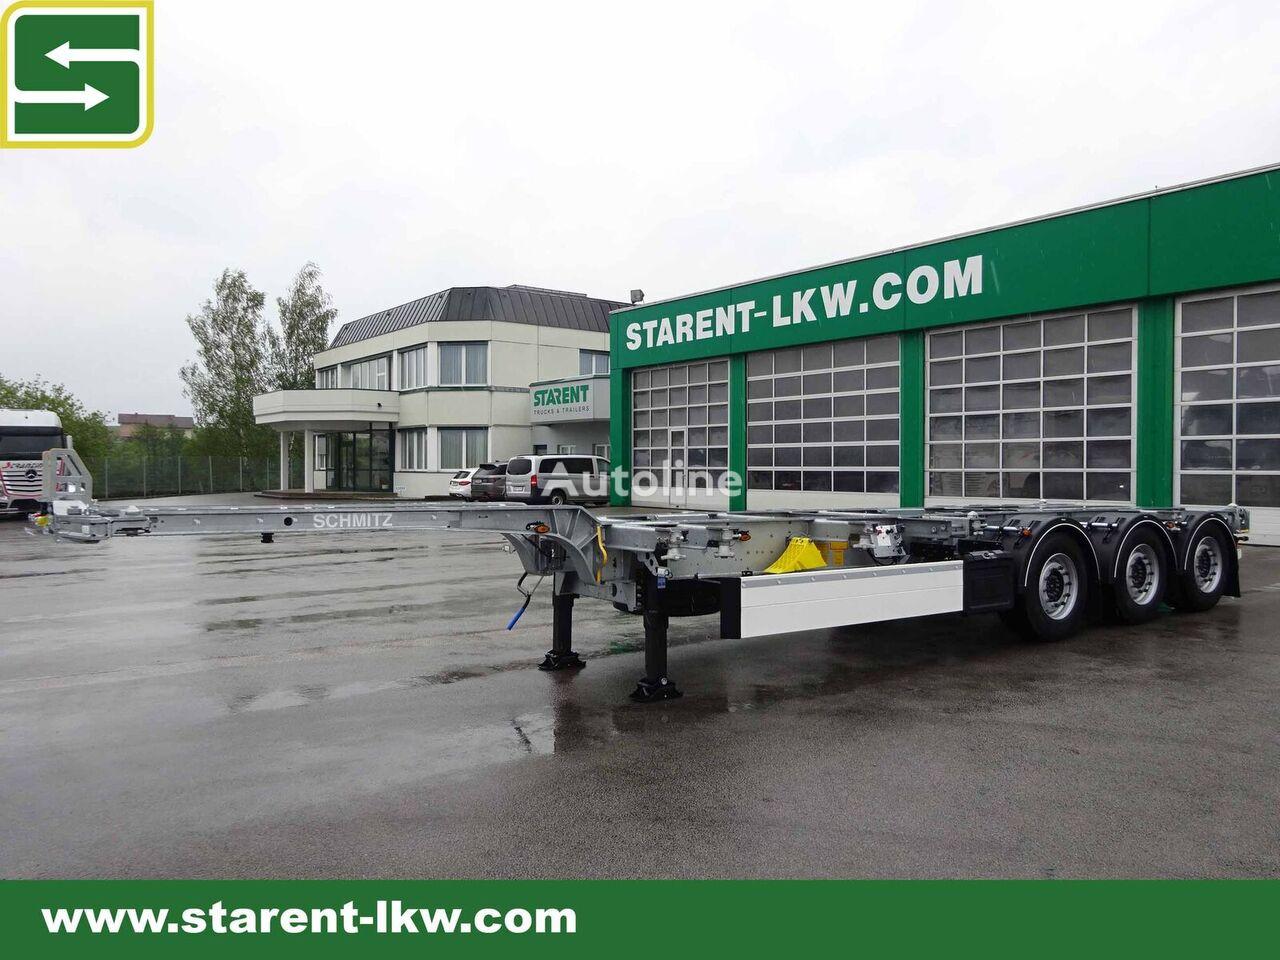 SCHMITZ CARGOBULL Containerchassis - 45' EURO 20', 30', 40', 45', High Cube, Lifta semirremolque de contenedores nuevo